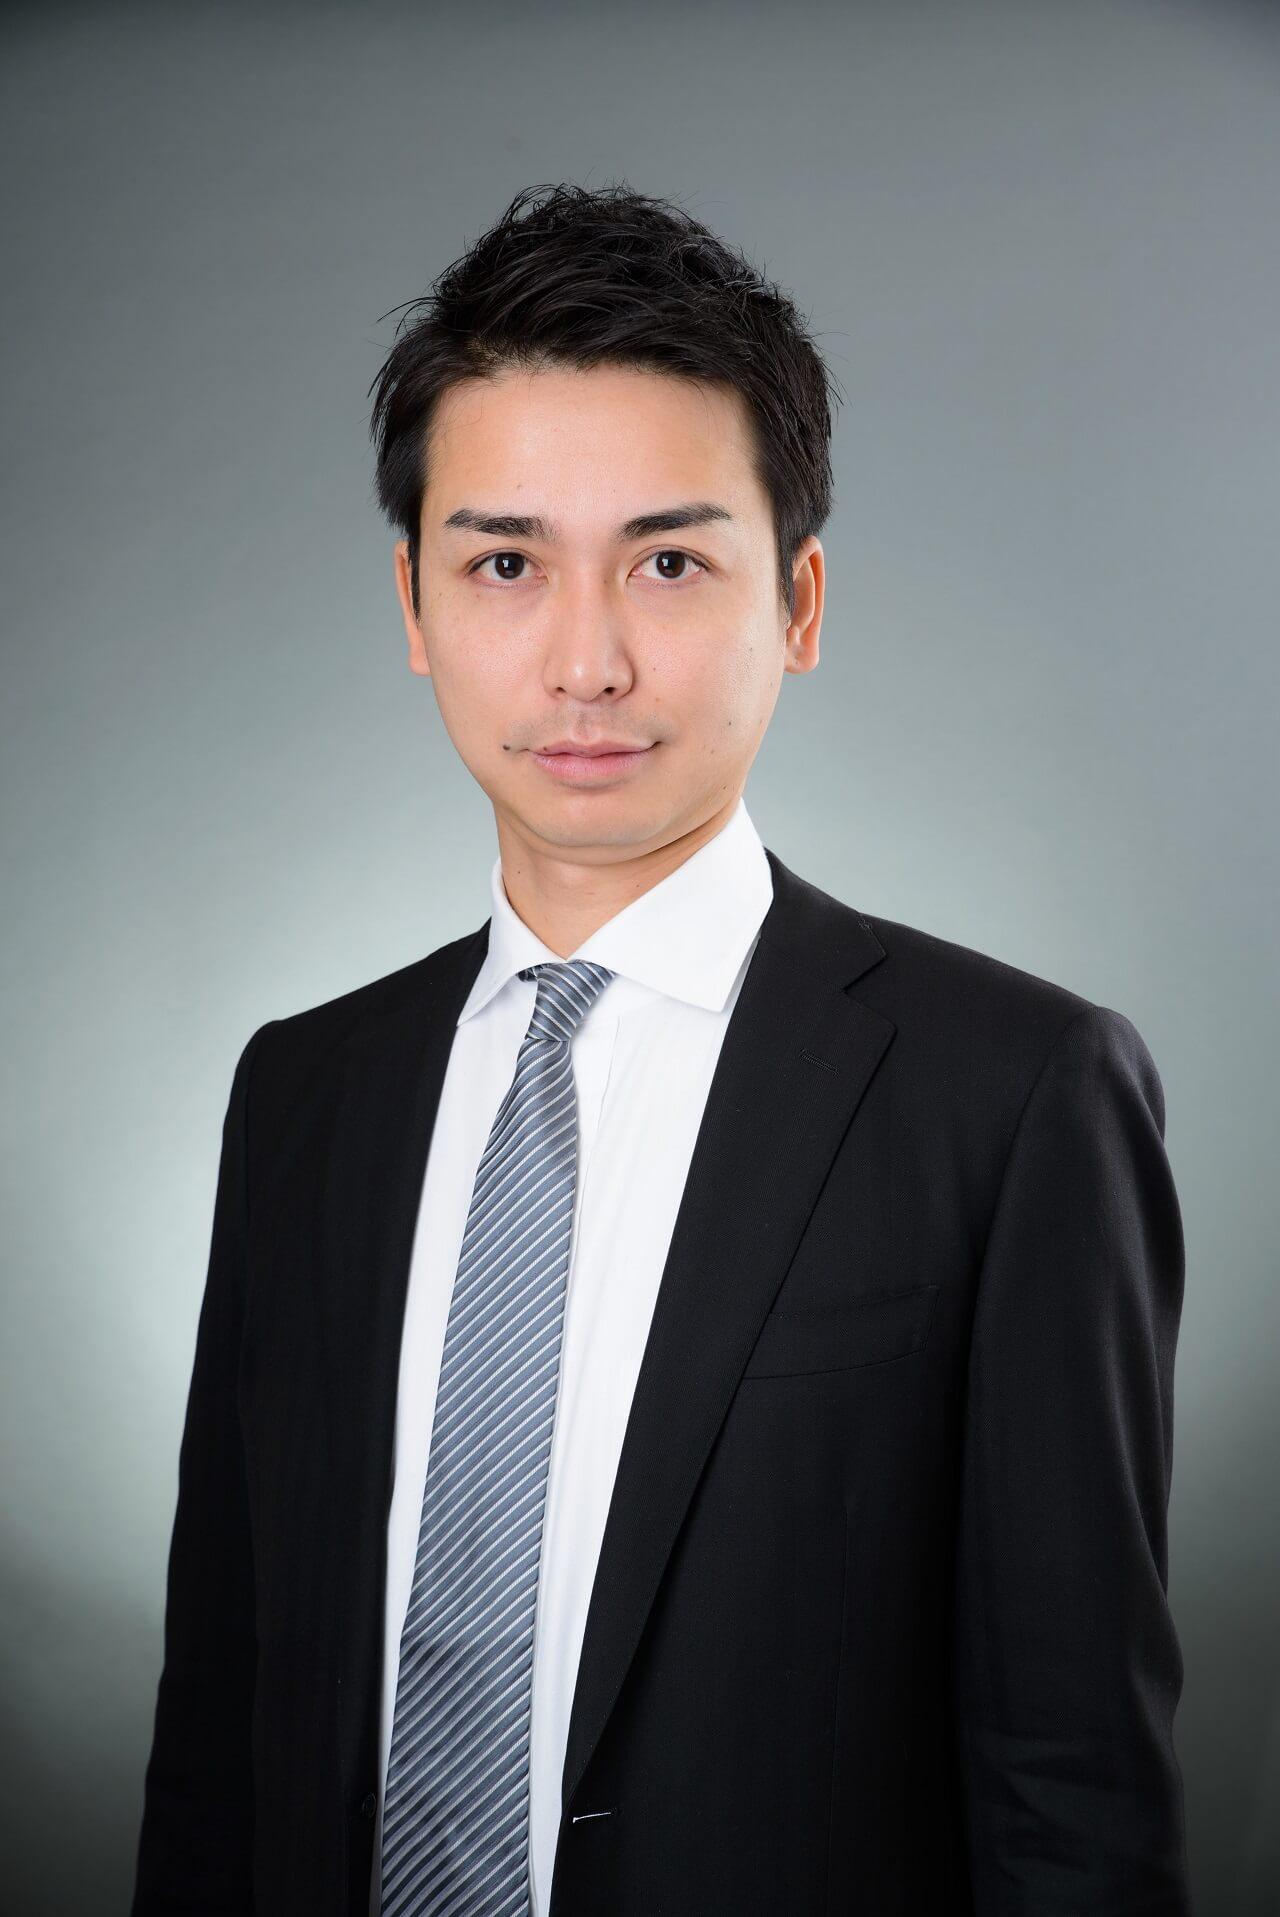 須﨑 要暁氏_株式会社Itseki Advisory Managing Partner 公認会計士・税理士